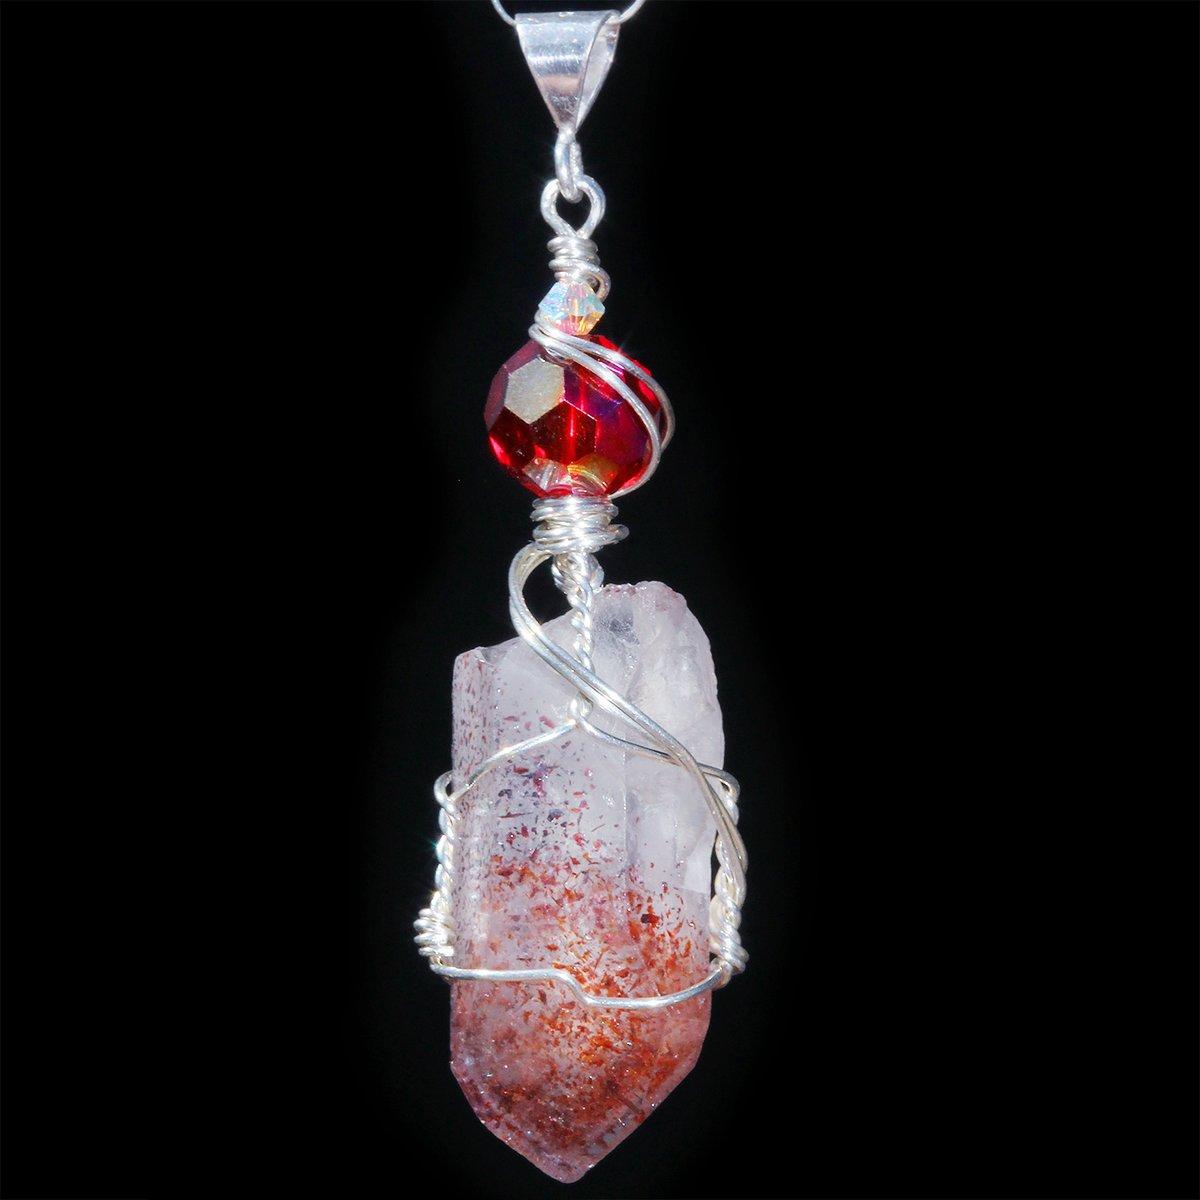 Harlequin Fire Quartz Crystal Handmade Pendant